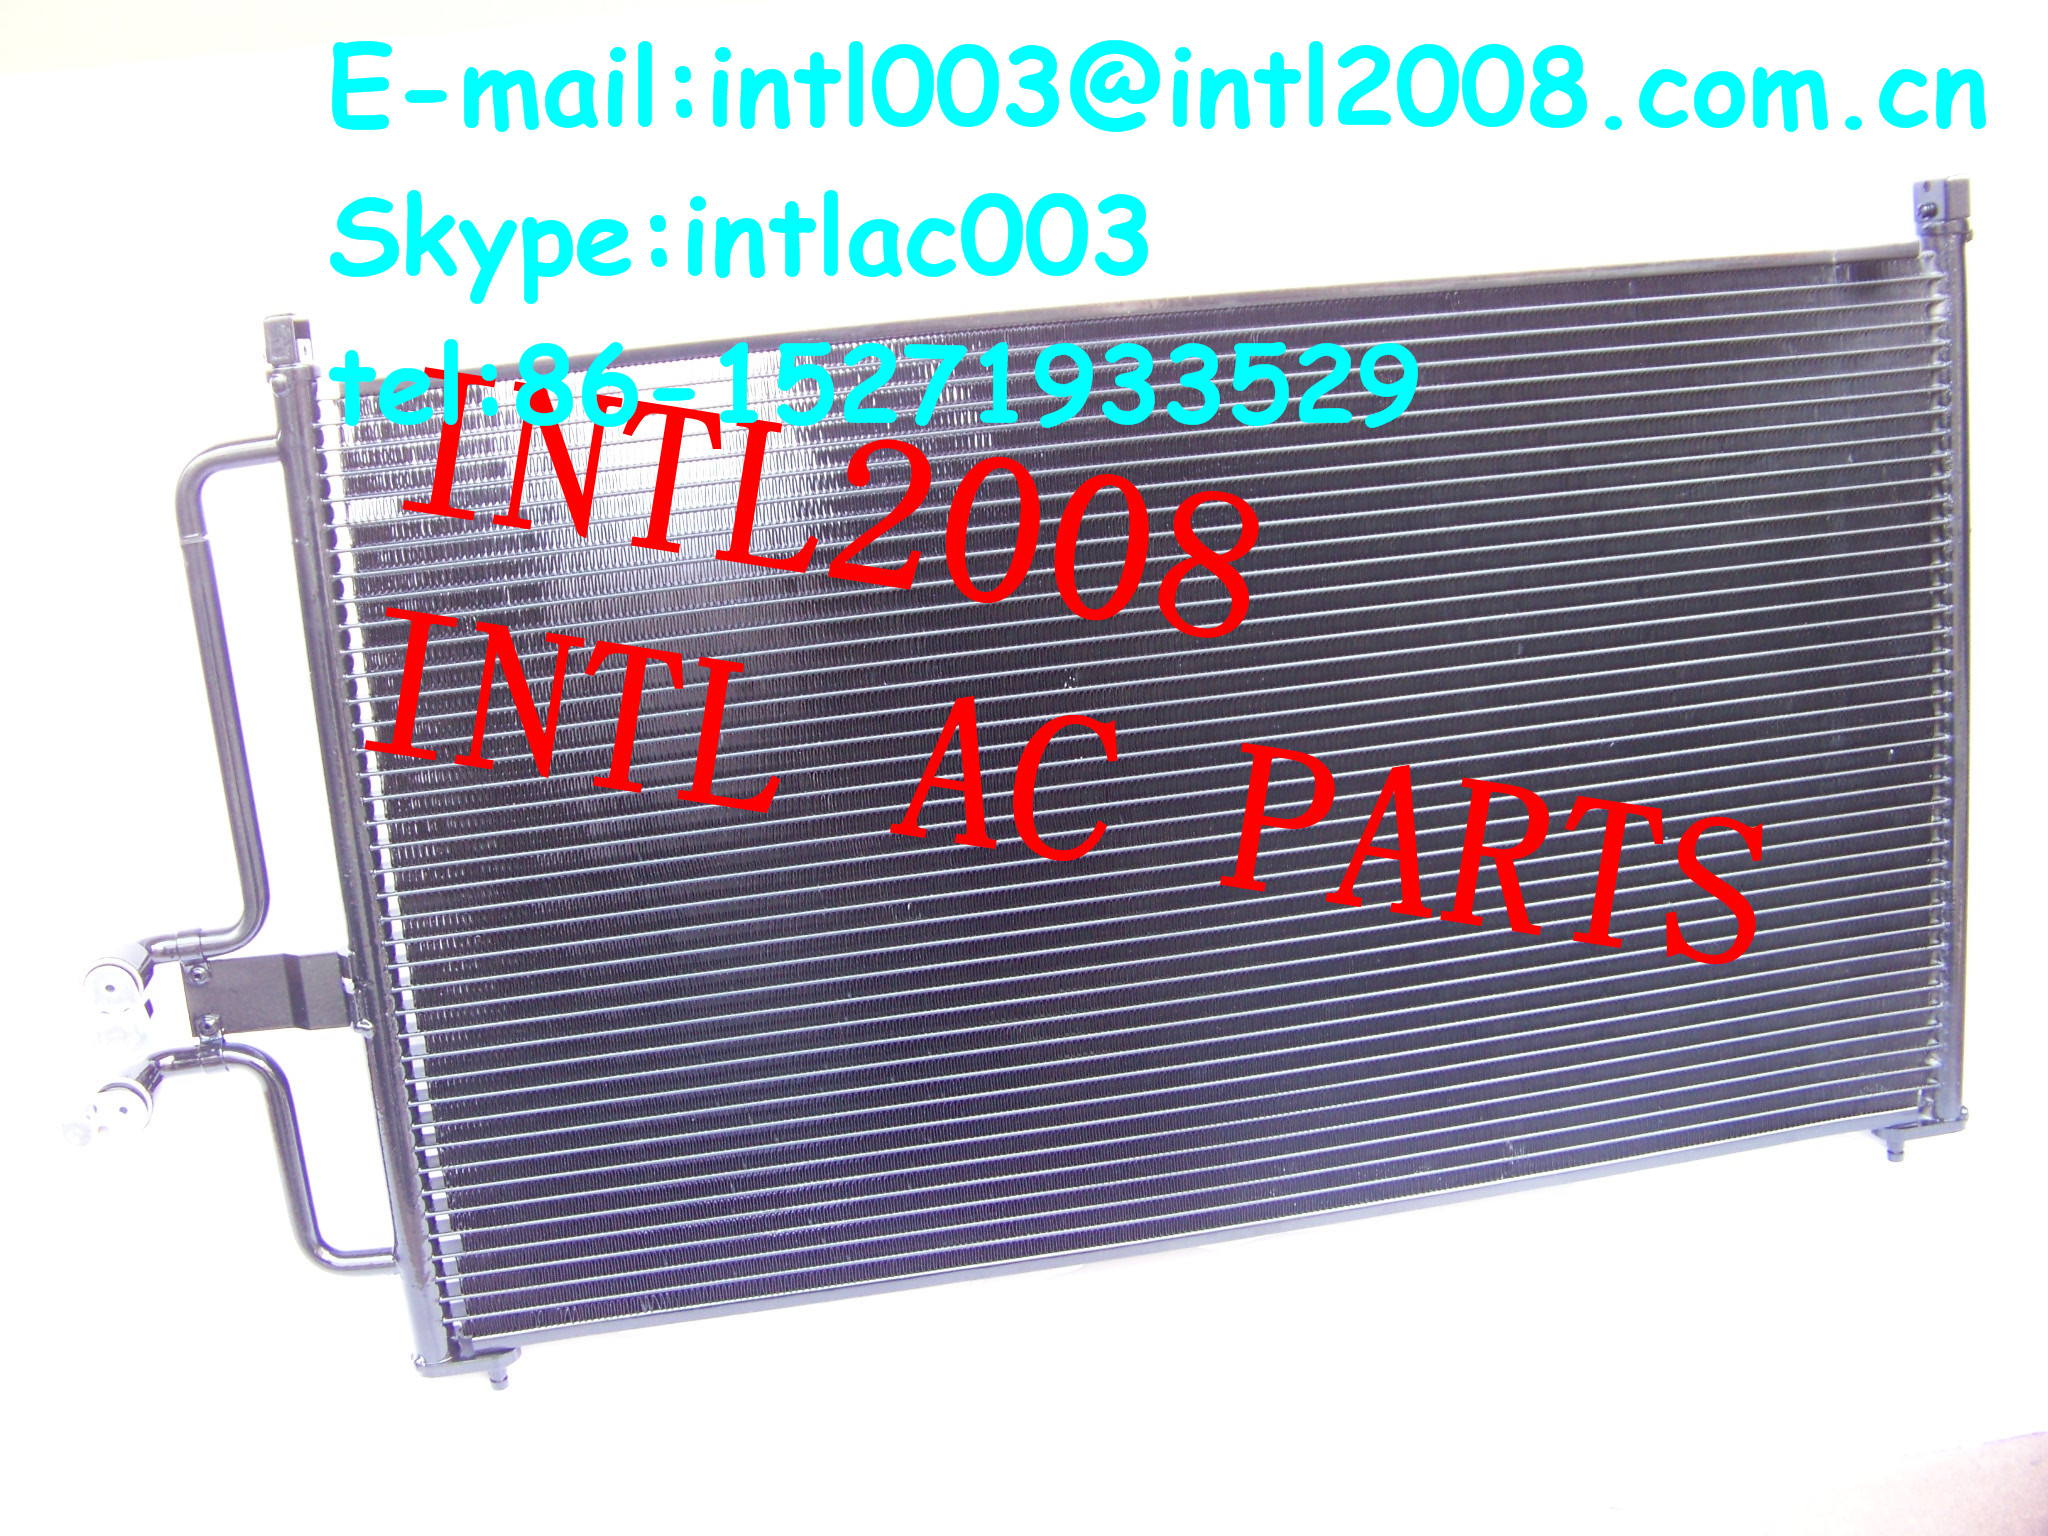 Acura 38924-PL2-N01 A//C Compressor Clutch Coil